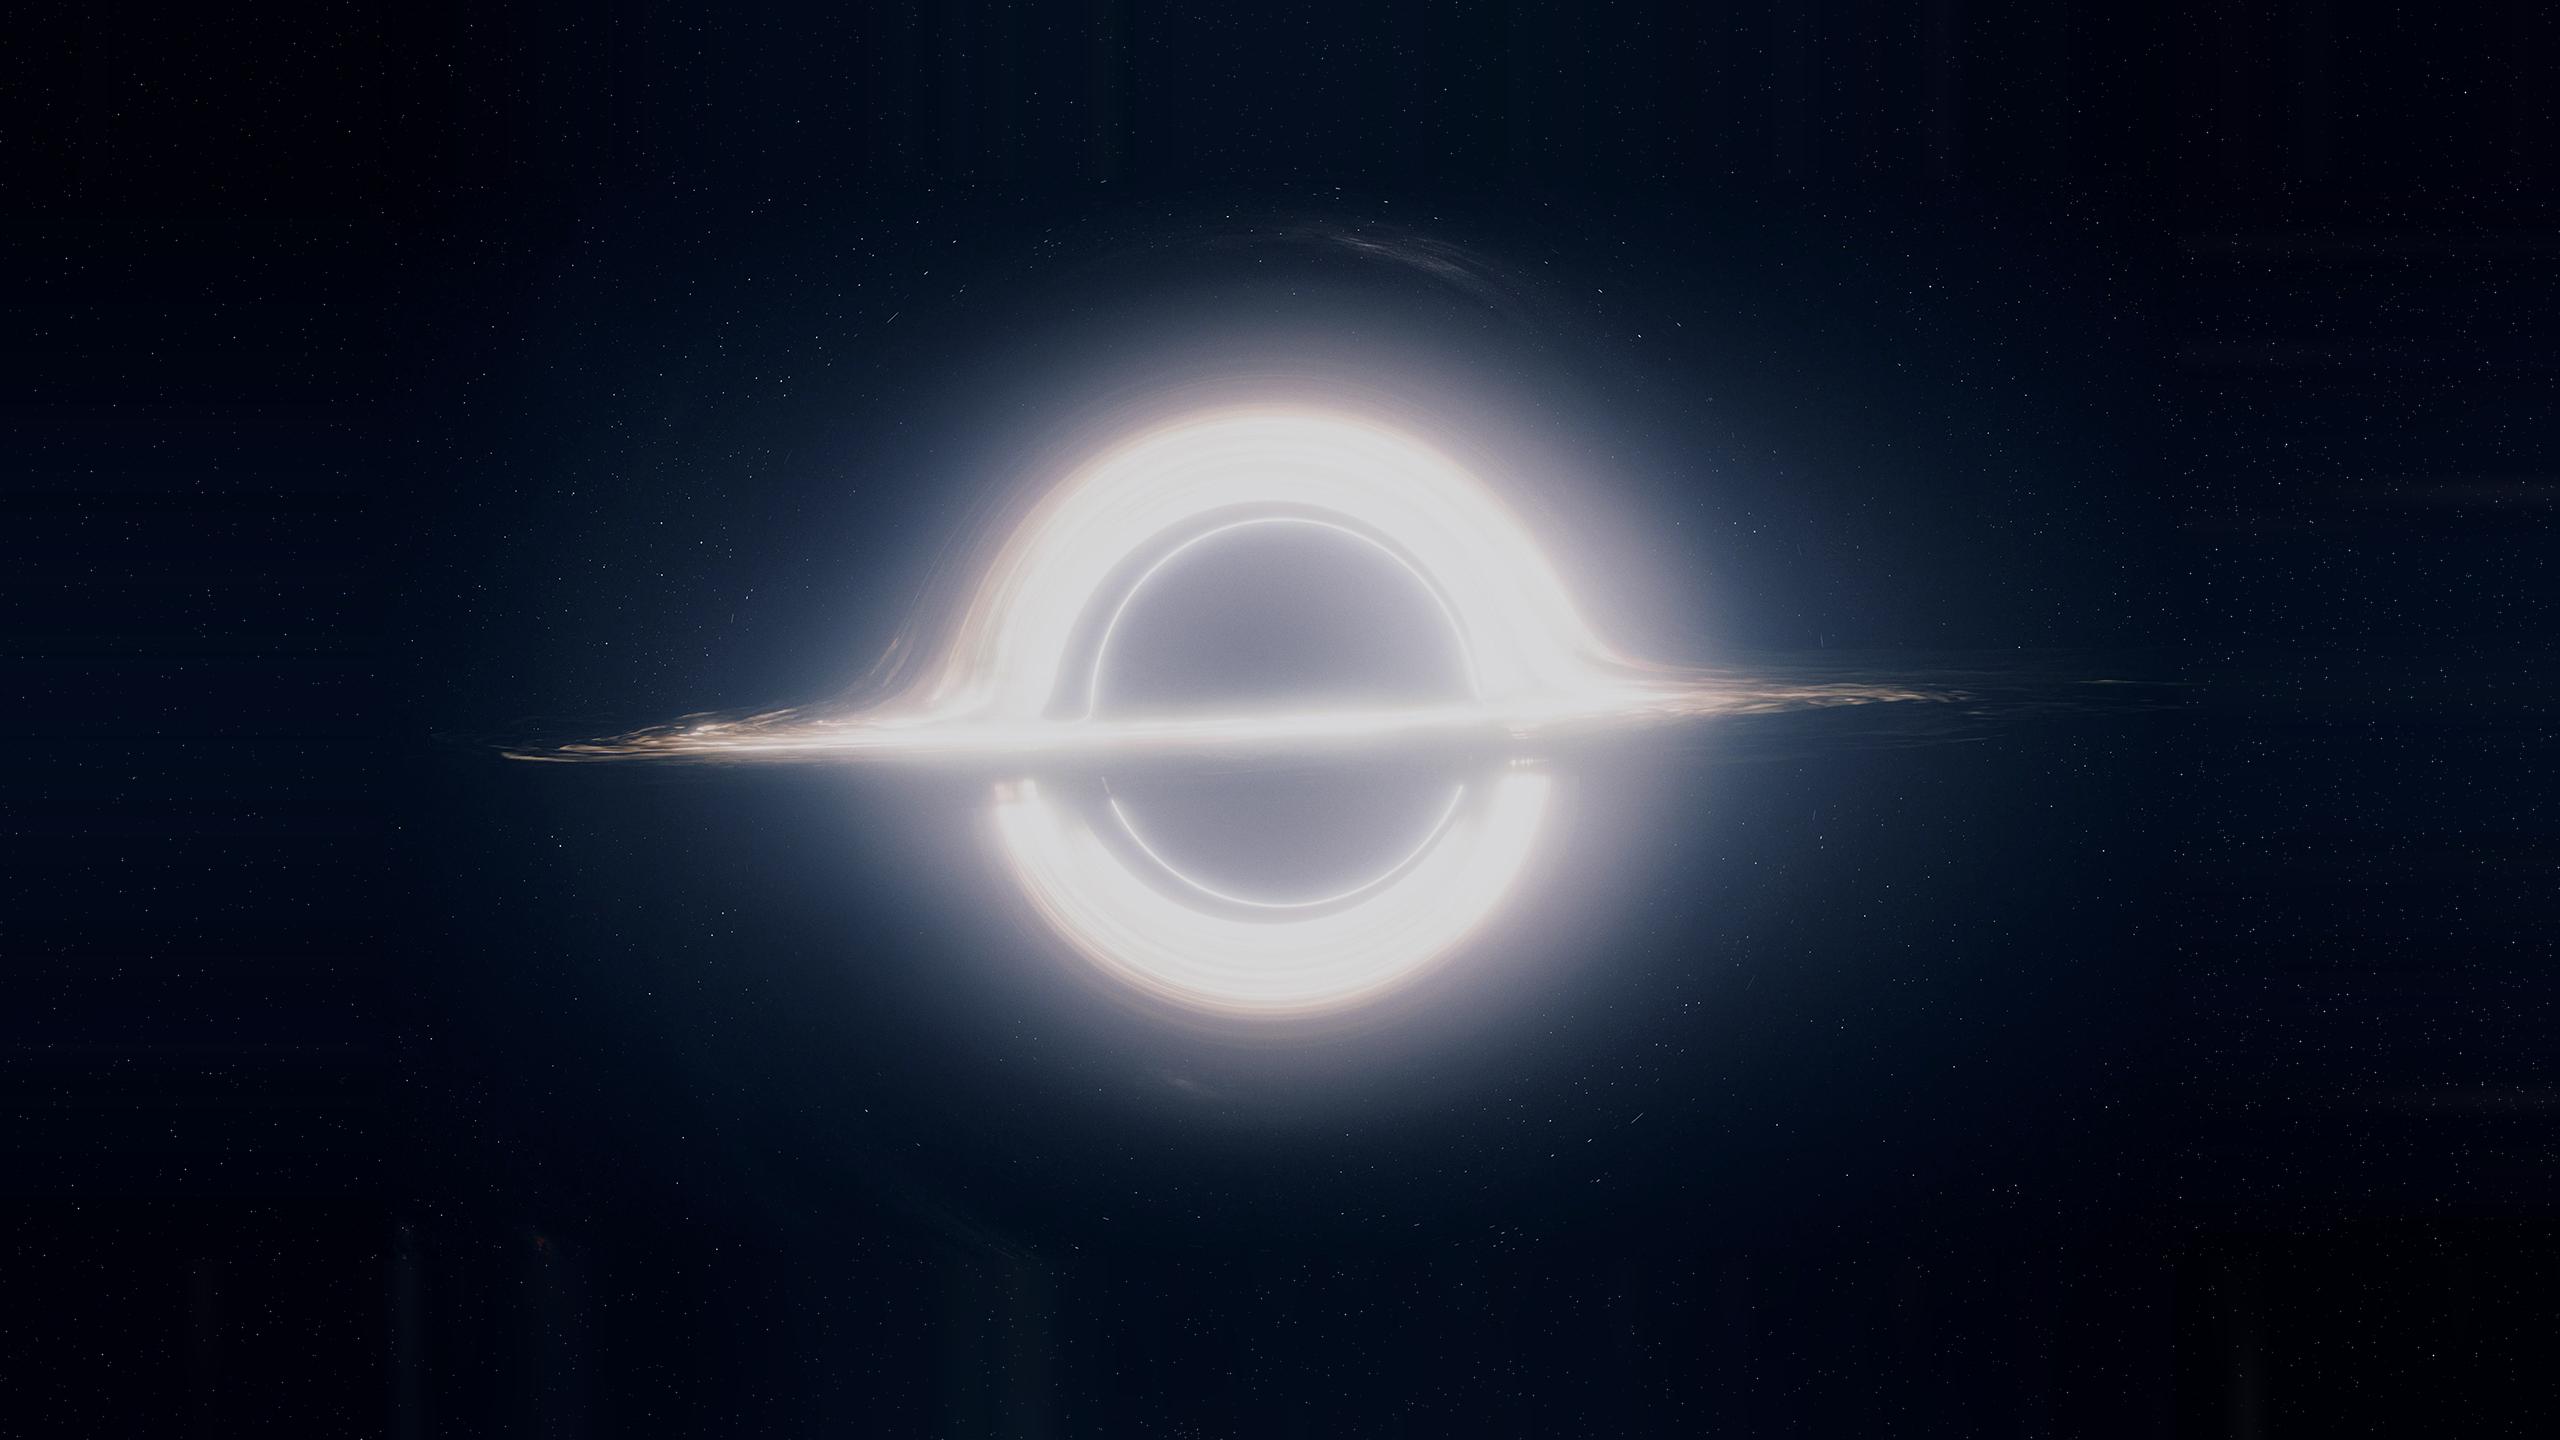 2560x1440 black hole - photo #23